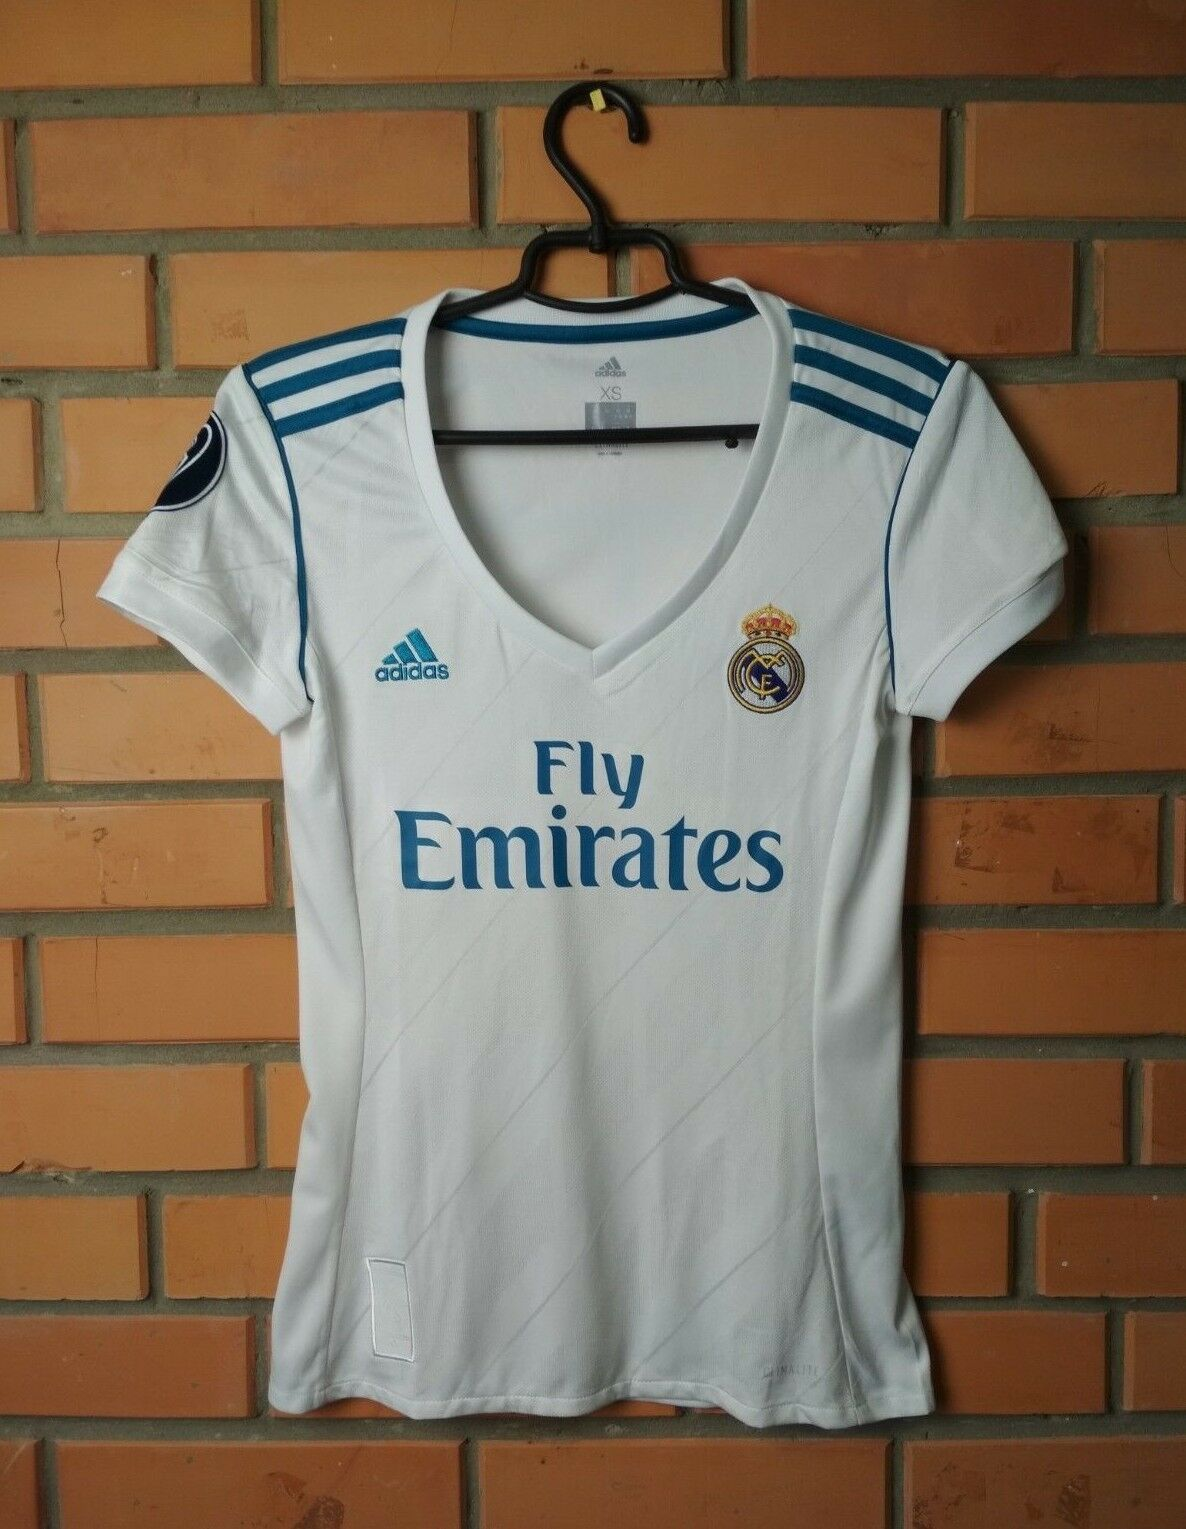 Camiseta de fútbol del Real Madrid 2018, camiseta de fútbol local, mujer Adidas talla XS